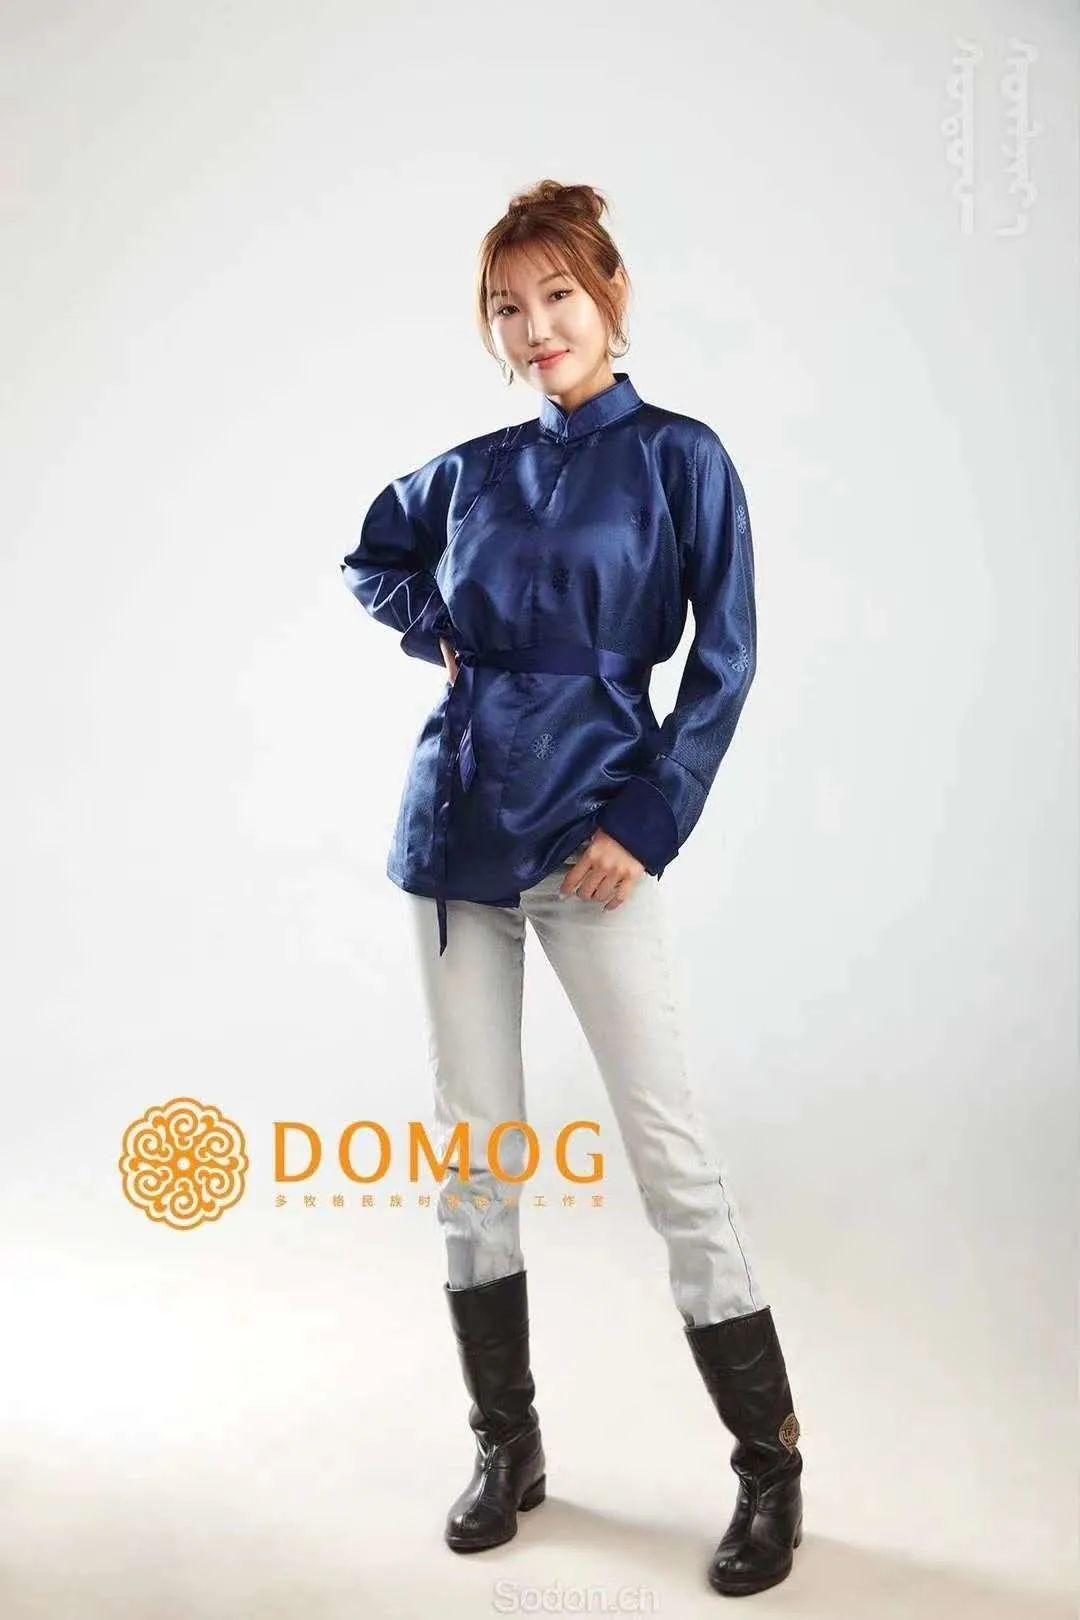 DOMOG 蒙古时装2020新款,民族与时尚的融合 第40张 DOMOG 蒙古时装2020新款,民族与时尚的融合 蒙古服饰